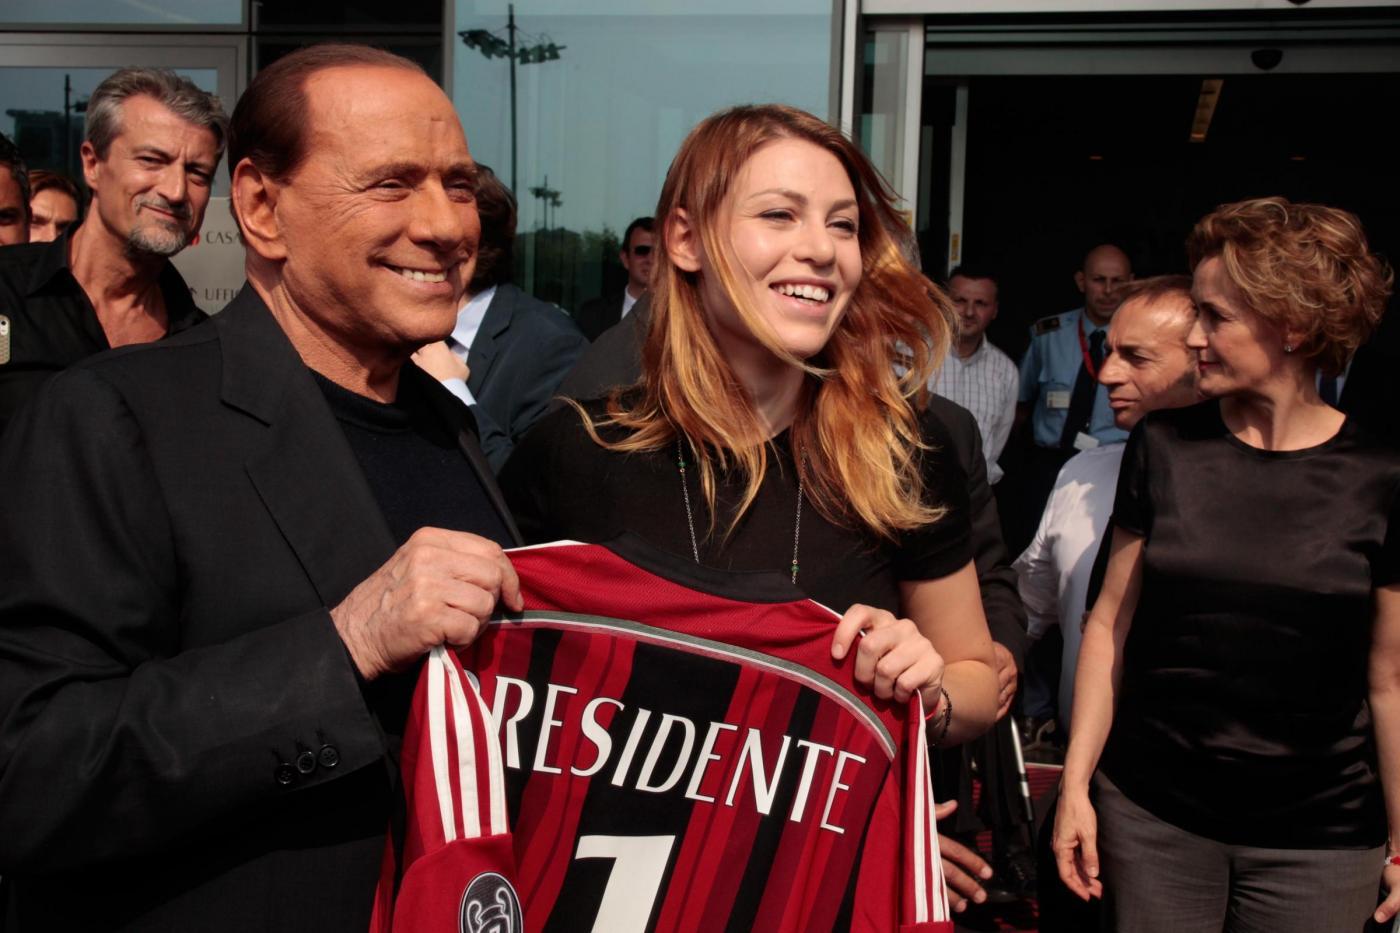 Cessione Milan, Berlusconi: